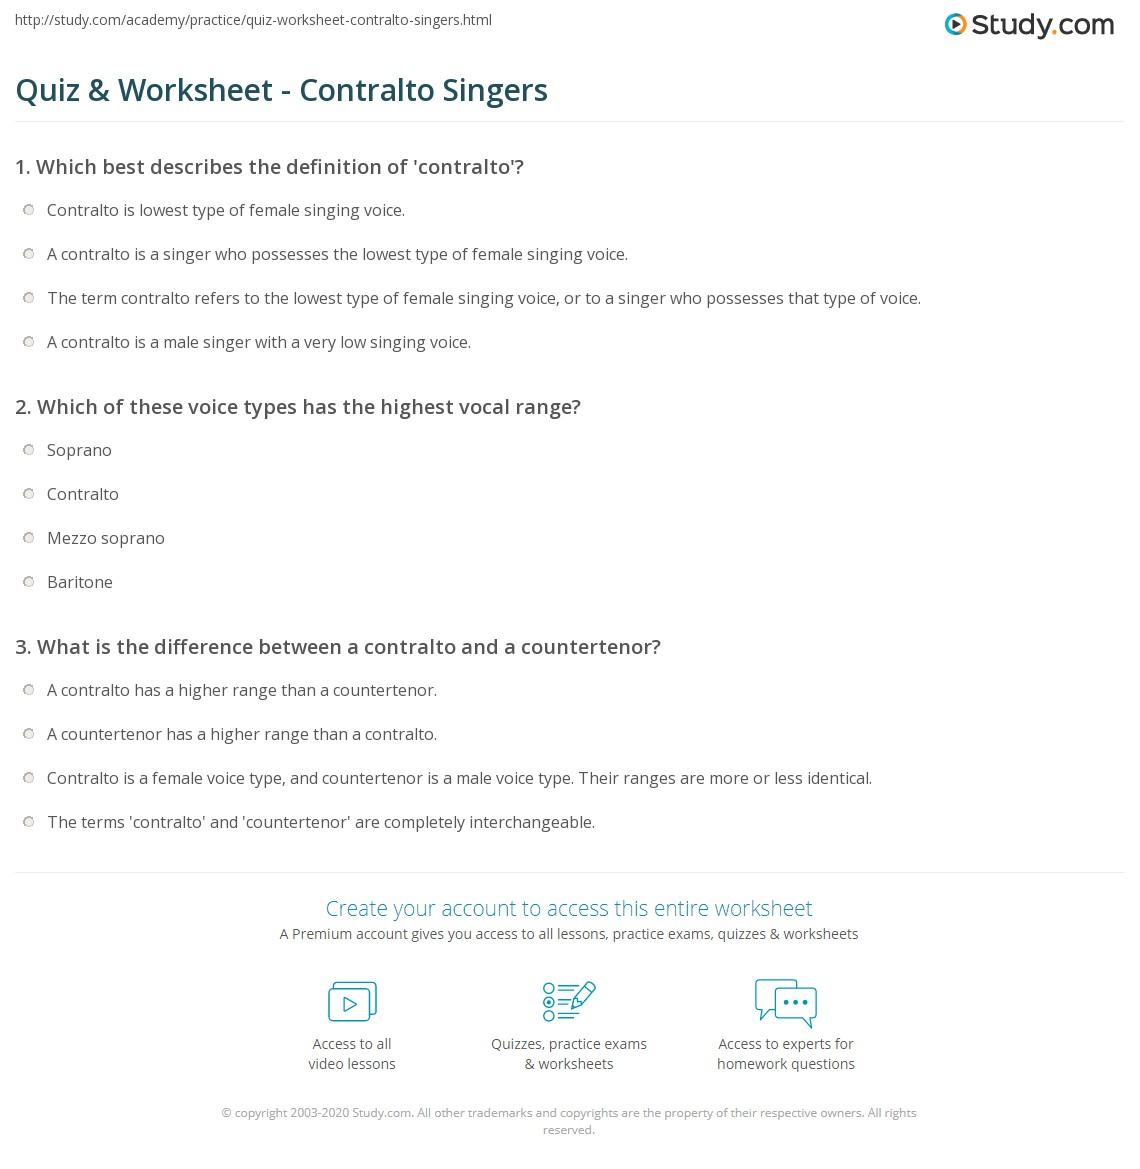 worksheet range definition breadandhearth. Black Bedroom Furniture Sets. Home Design Ideas